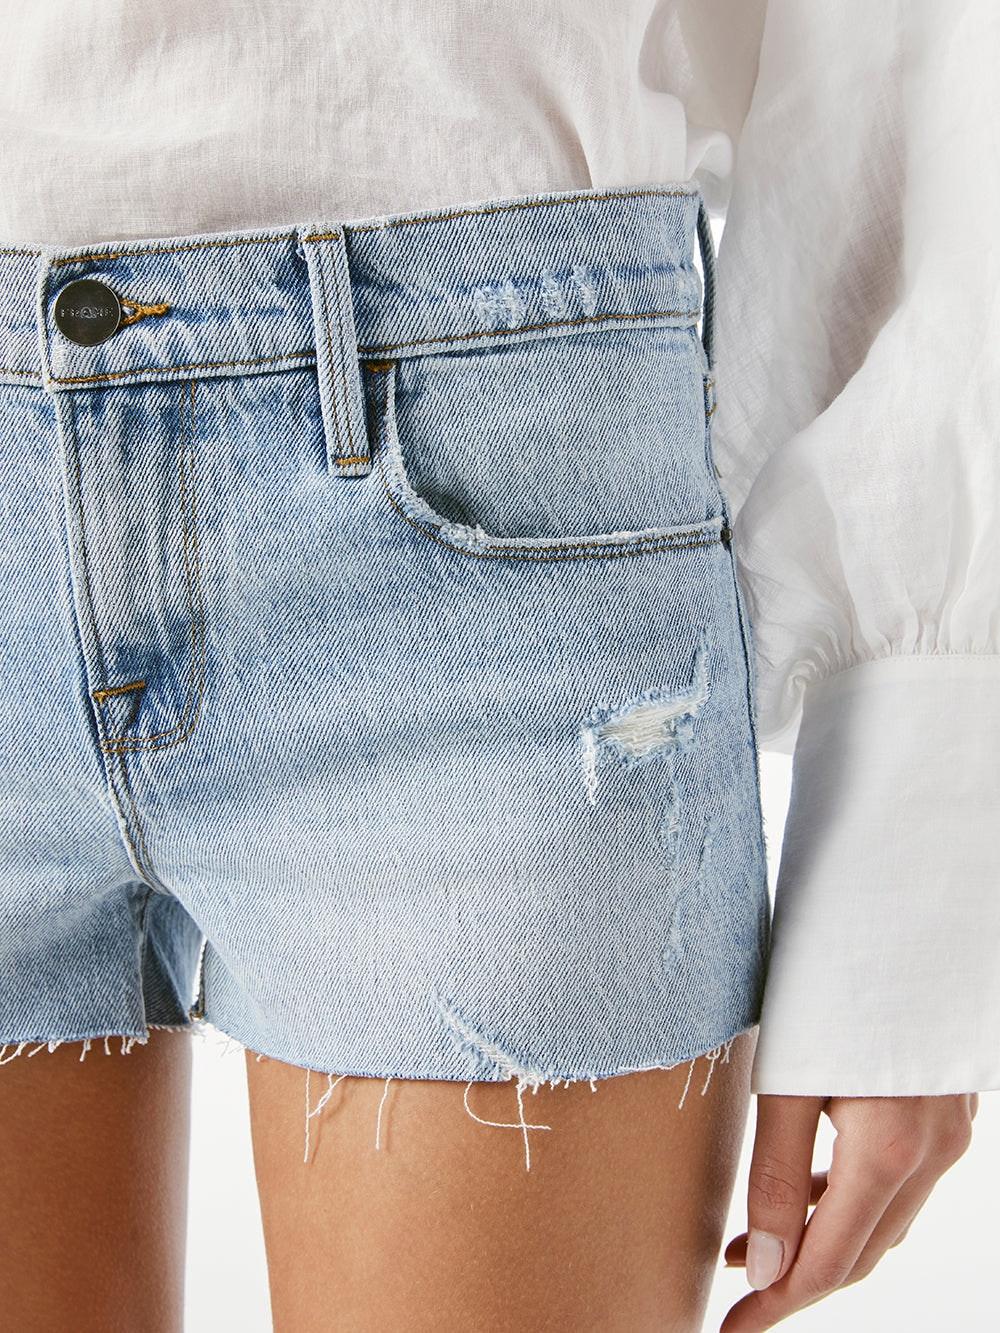 shorts detail view